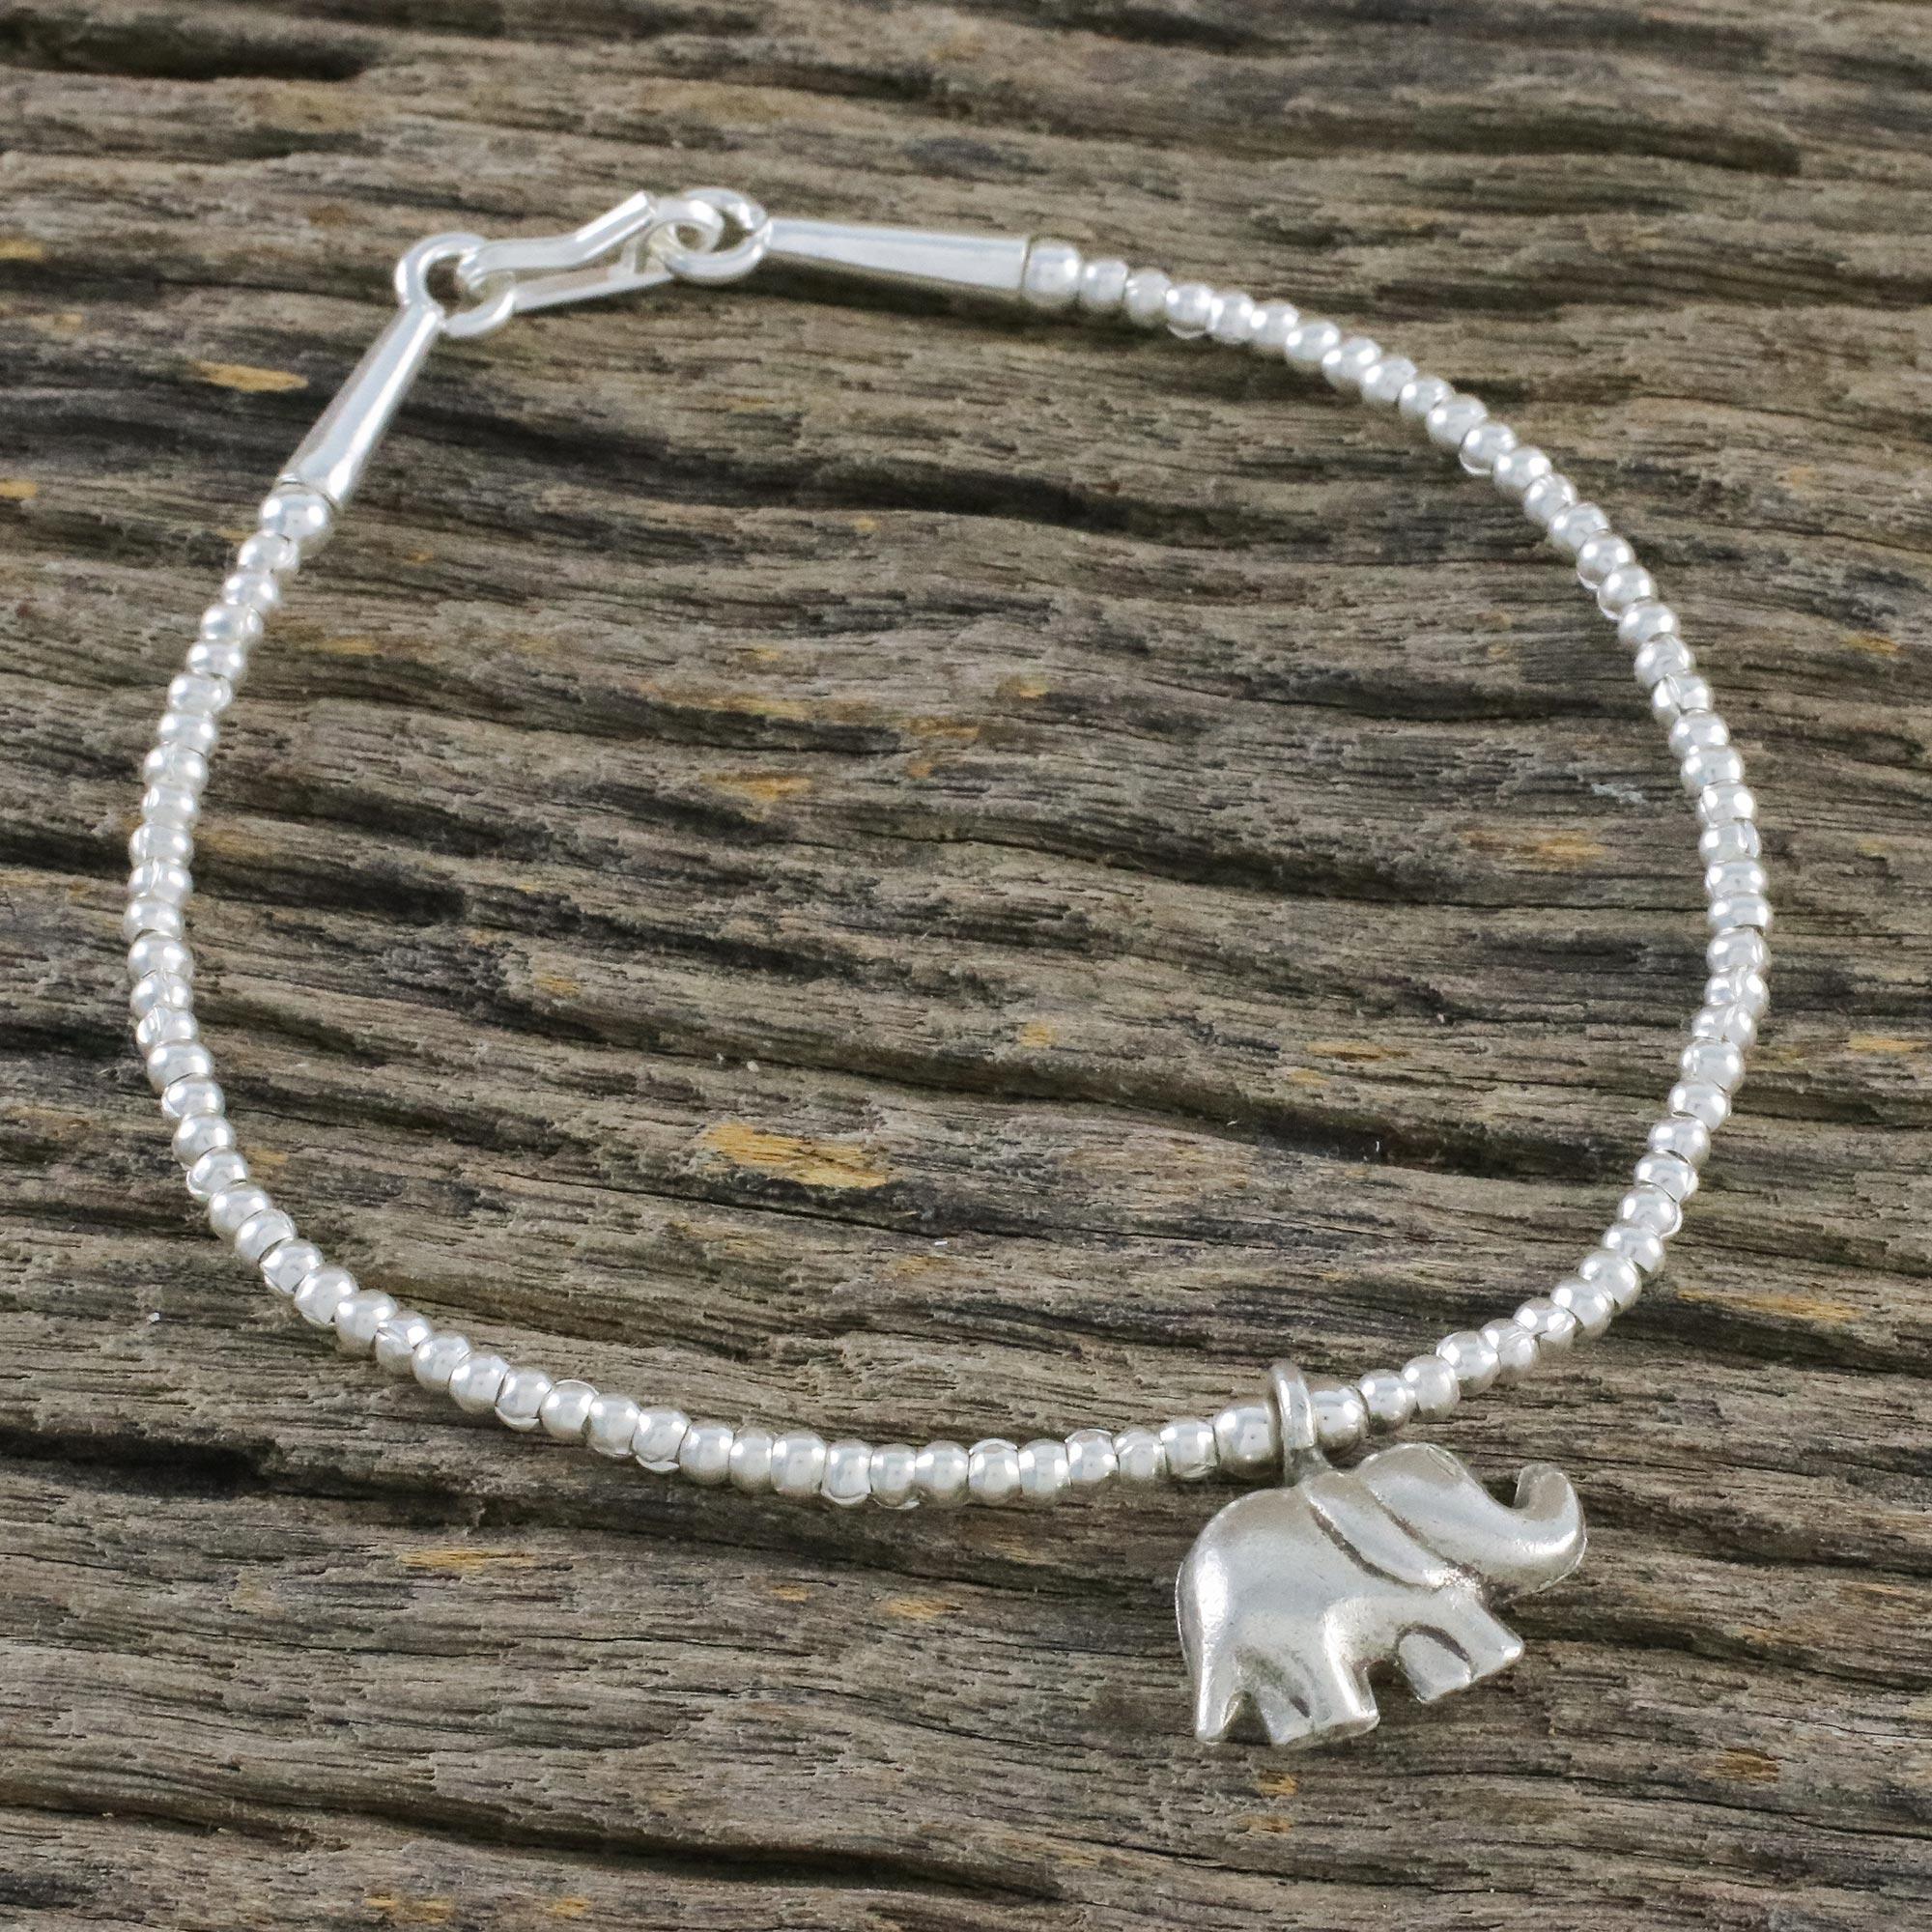 be592a0f1a373 Fine Silver Elephant Charm, Sterling Silver Beaded Bracelet, 'Elephant's  Charm'